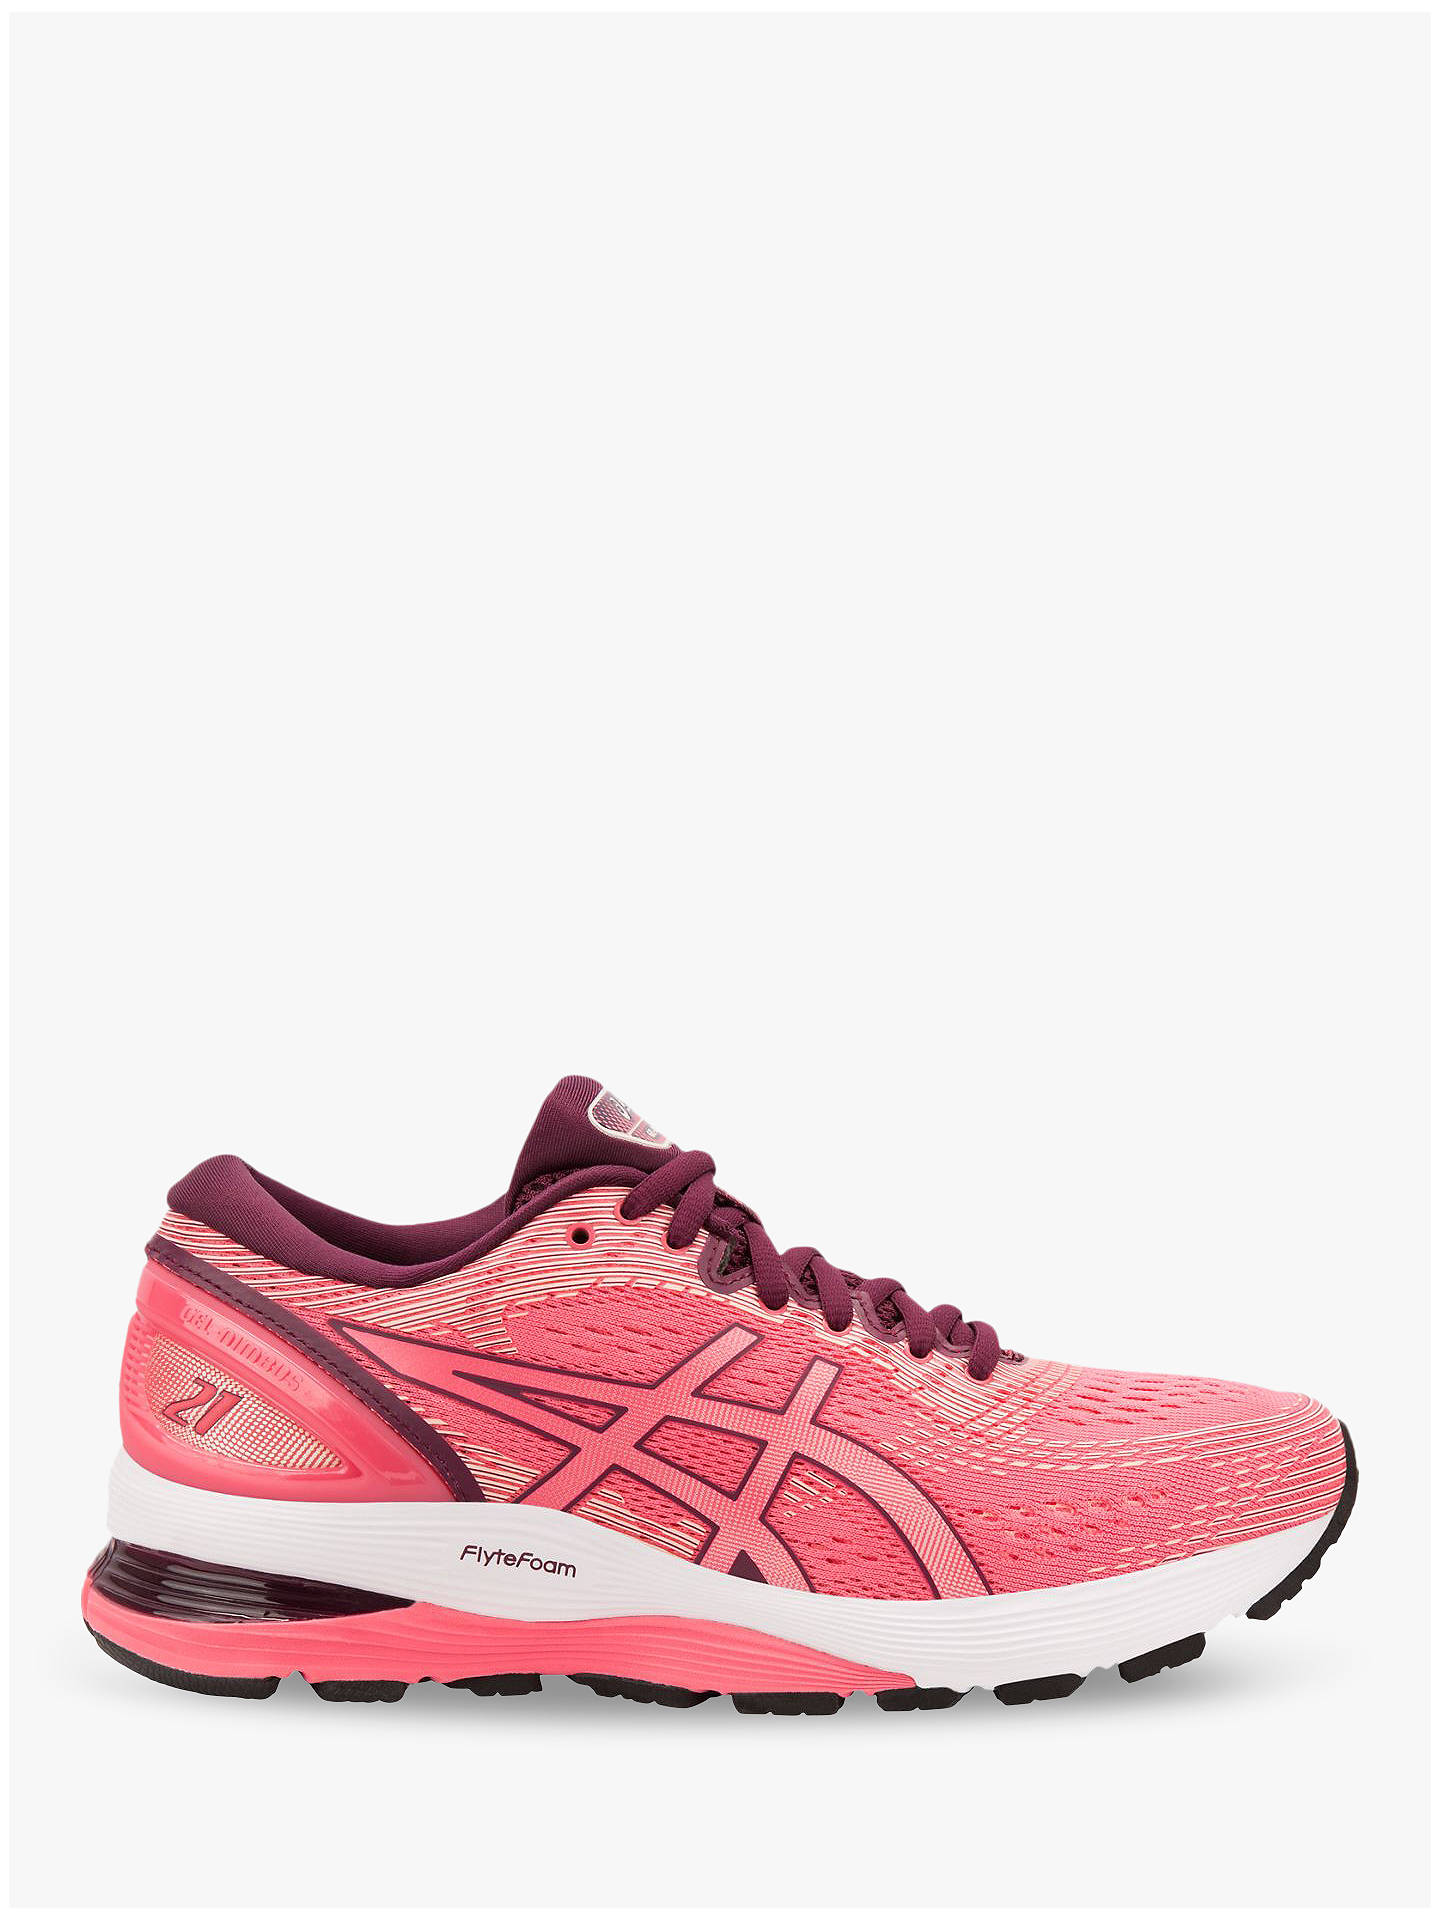 f83b5c81ae5 Buy ASICS GEL-NIMBUS 21 Women's Running Shoes, Pink Cameo/Baked Pink, ...